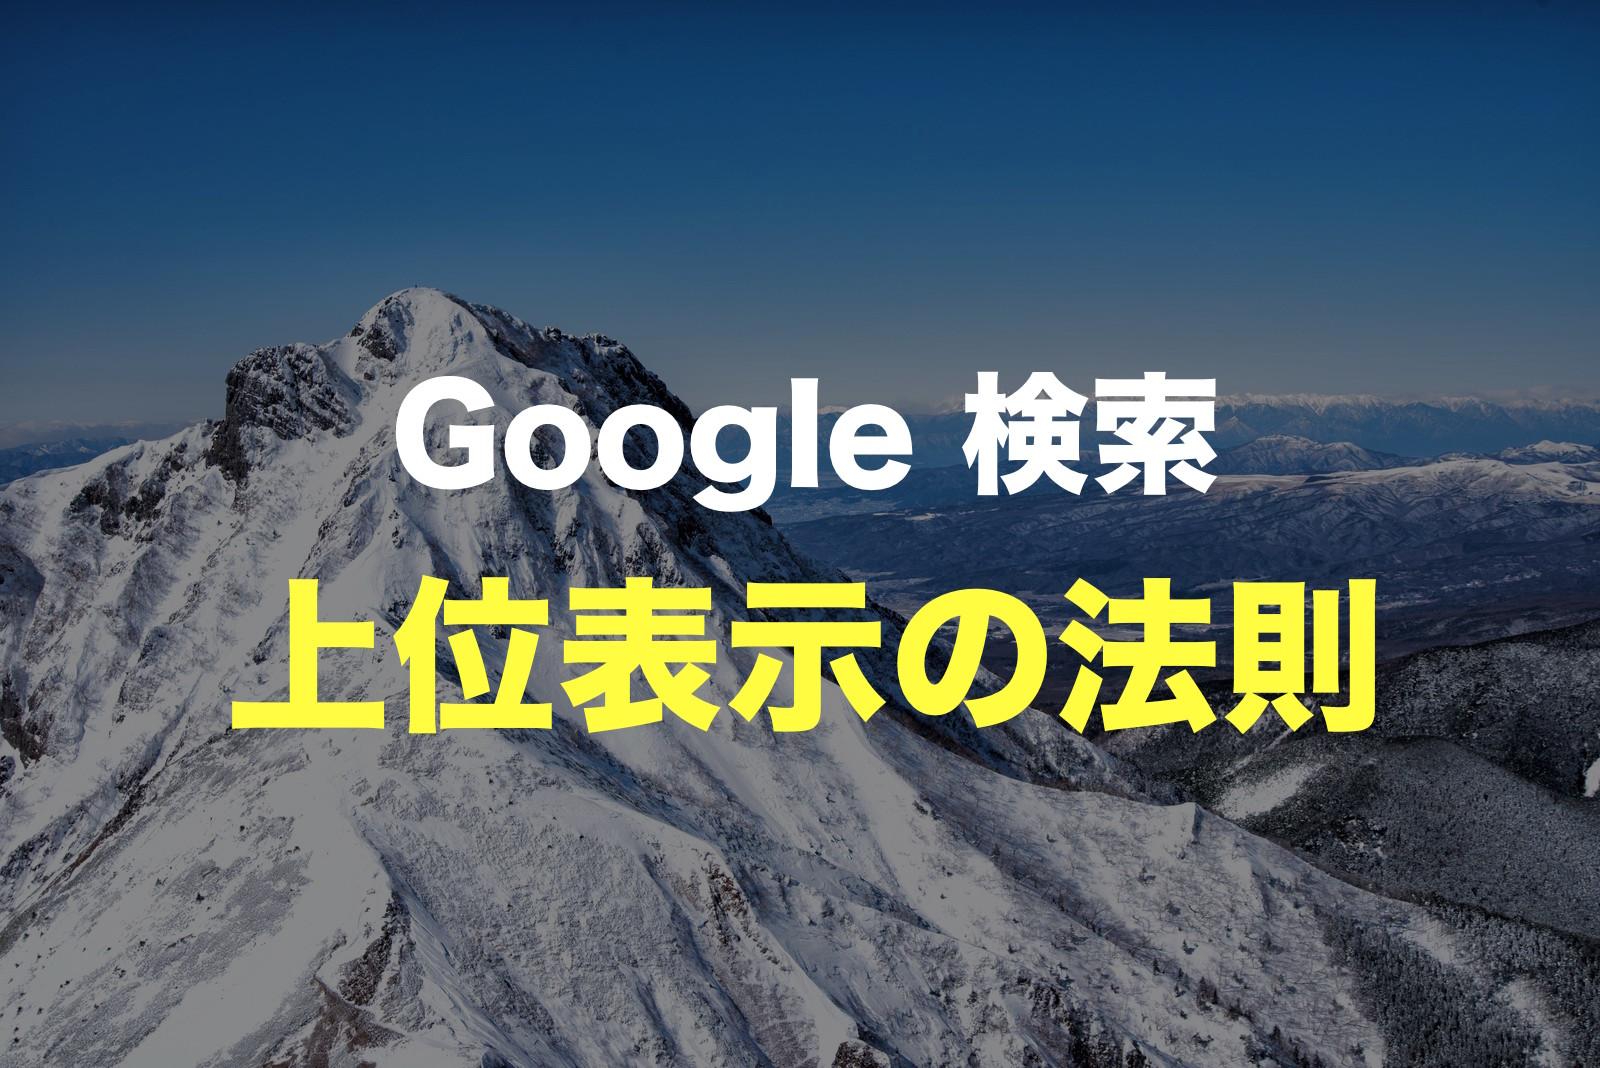 Google 検索で上位表示される唯一の法則。ブログやホームページの効果的なSEO対策